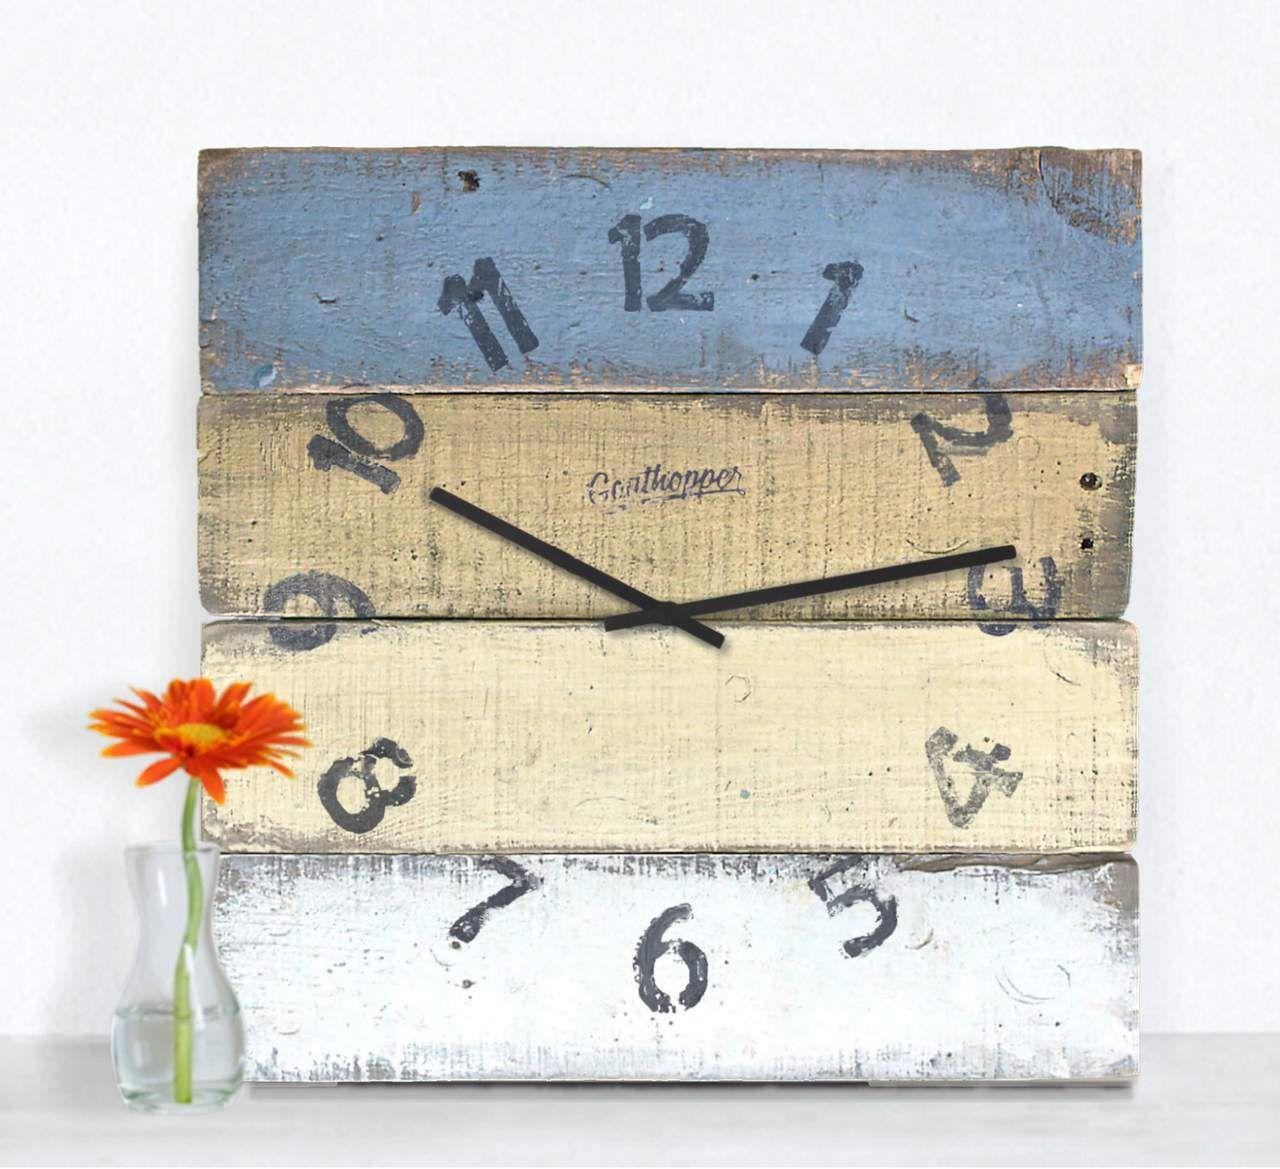 Eggplant Mustard Kitchen Wall Clock Pickwick In 2020 Wall Clock Distressed Wall Clock Kitchen Wall Clocks